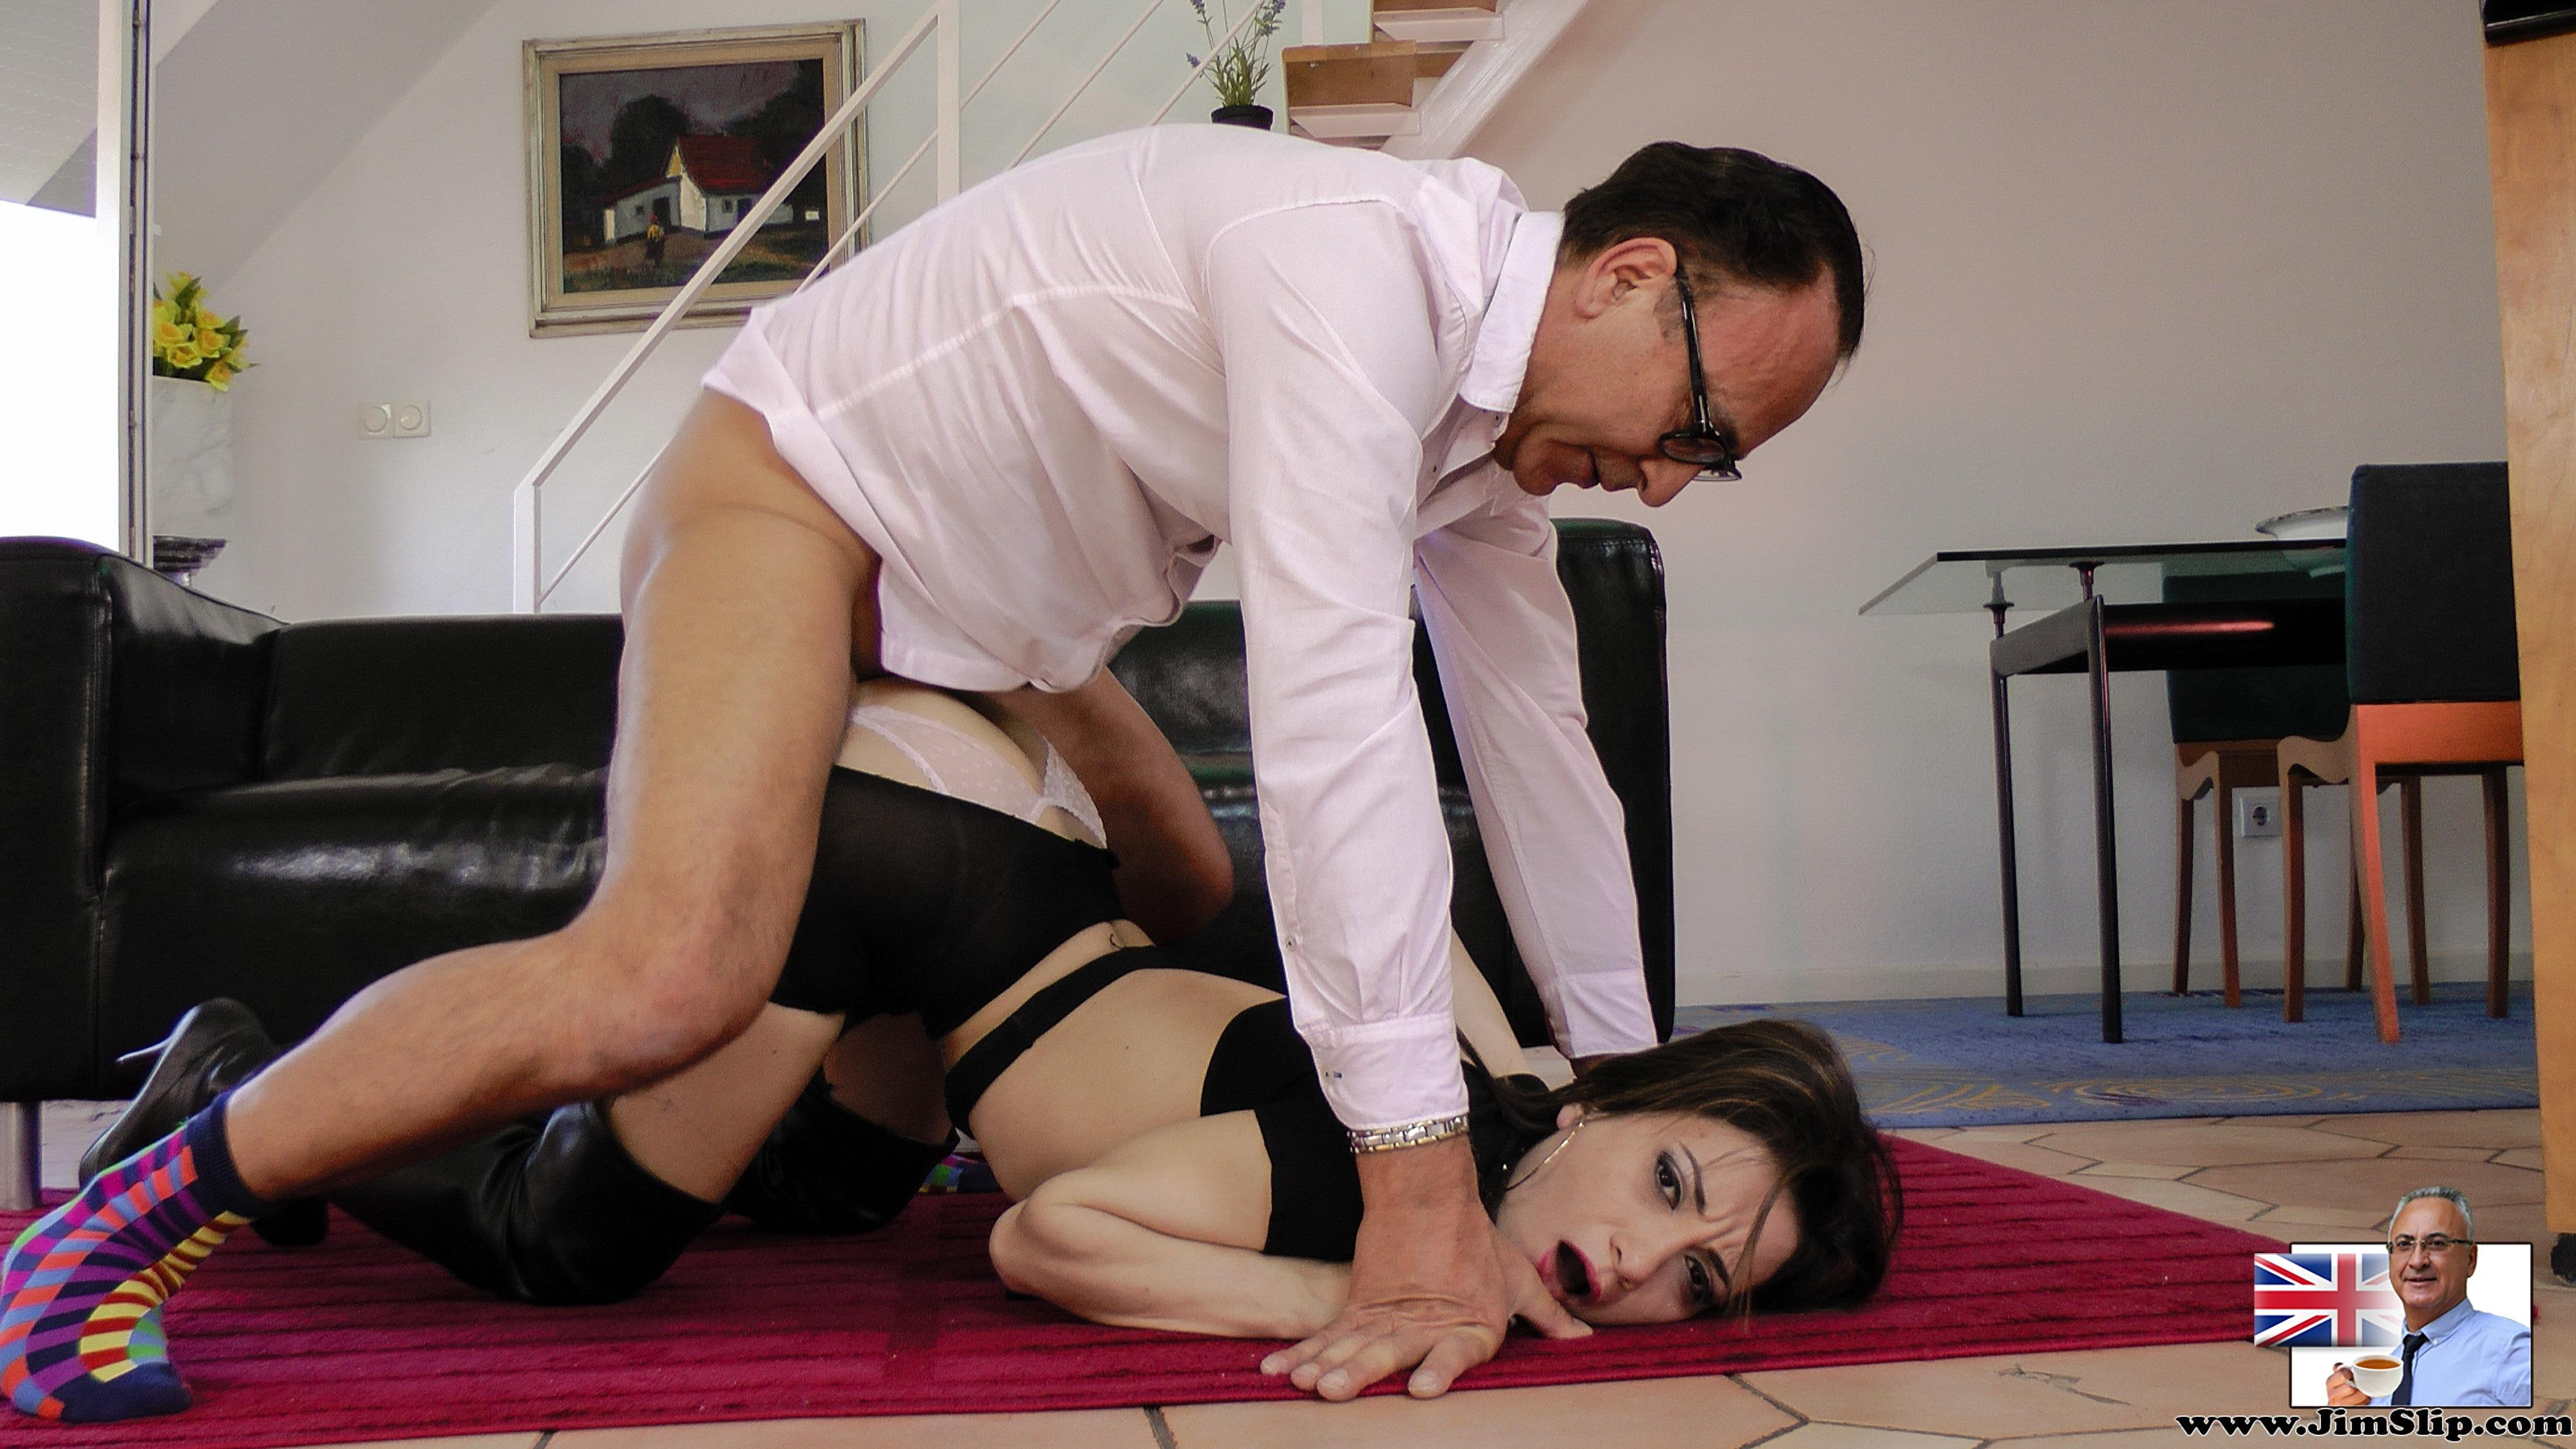 Making of a whore karla romano - 5 5